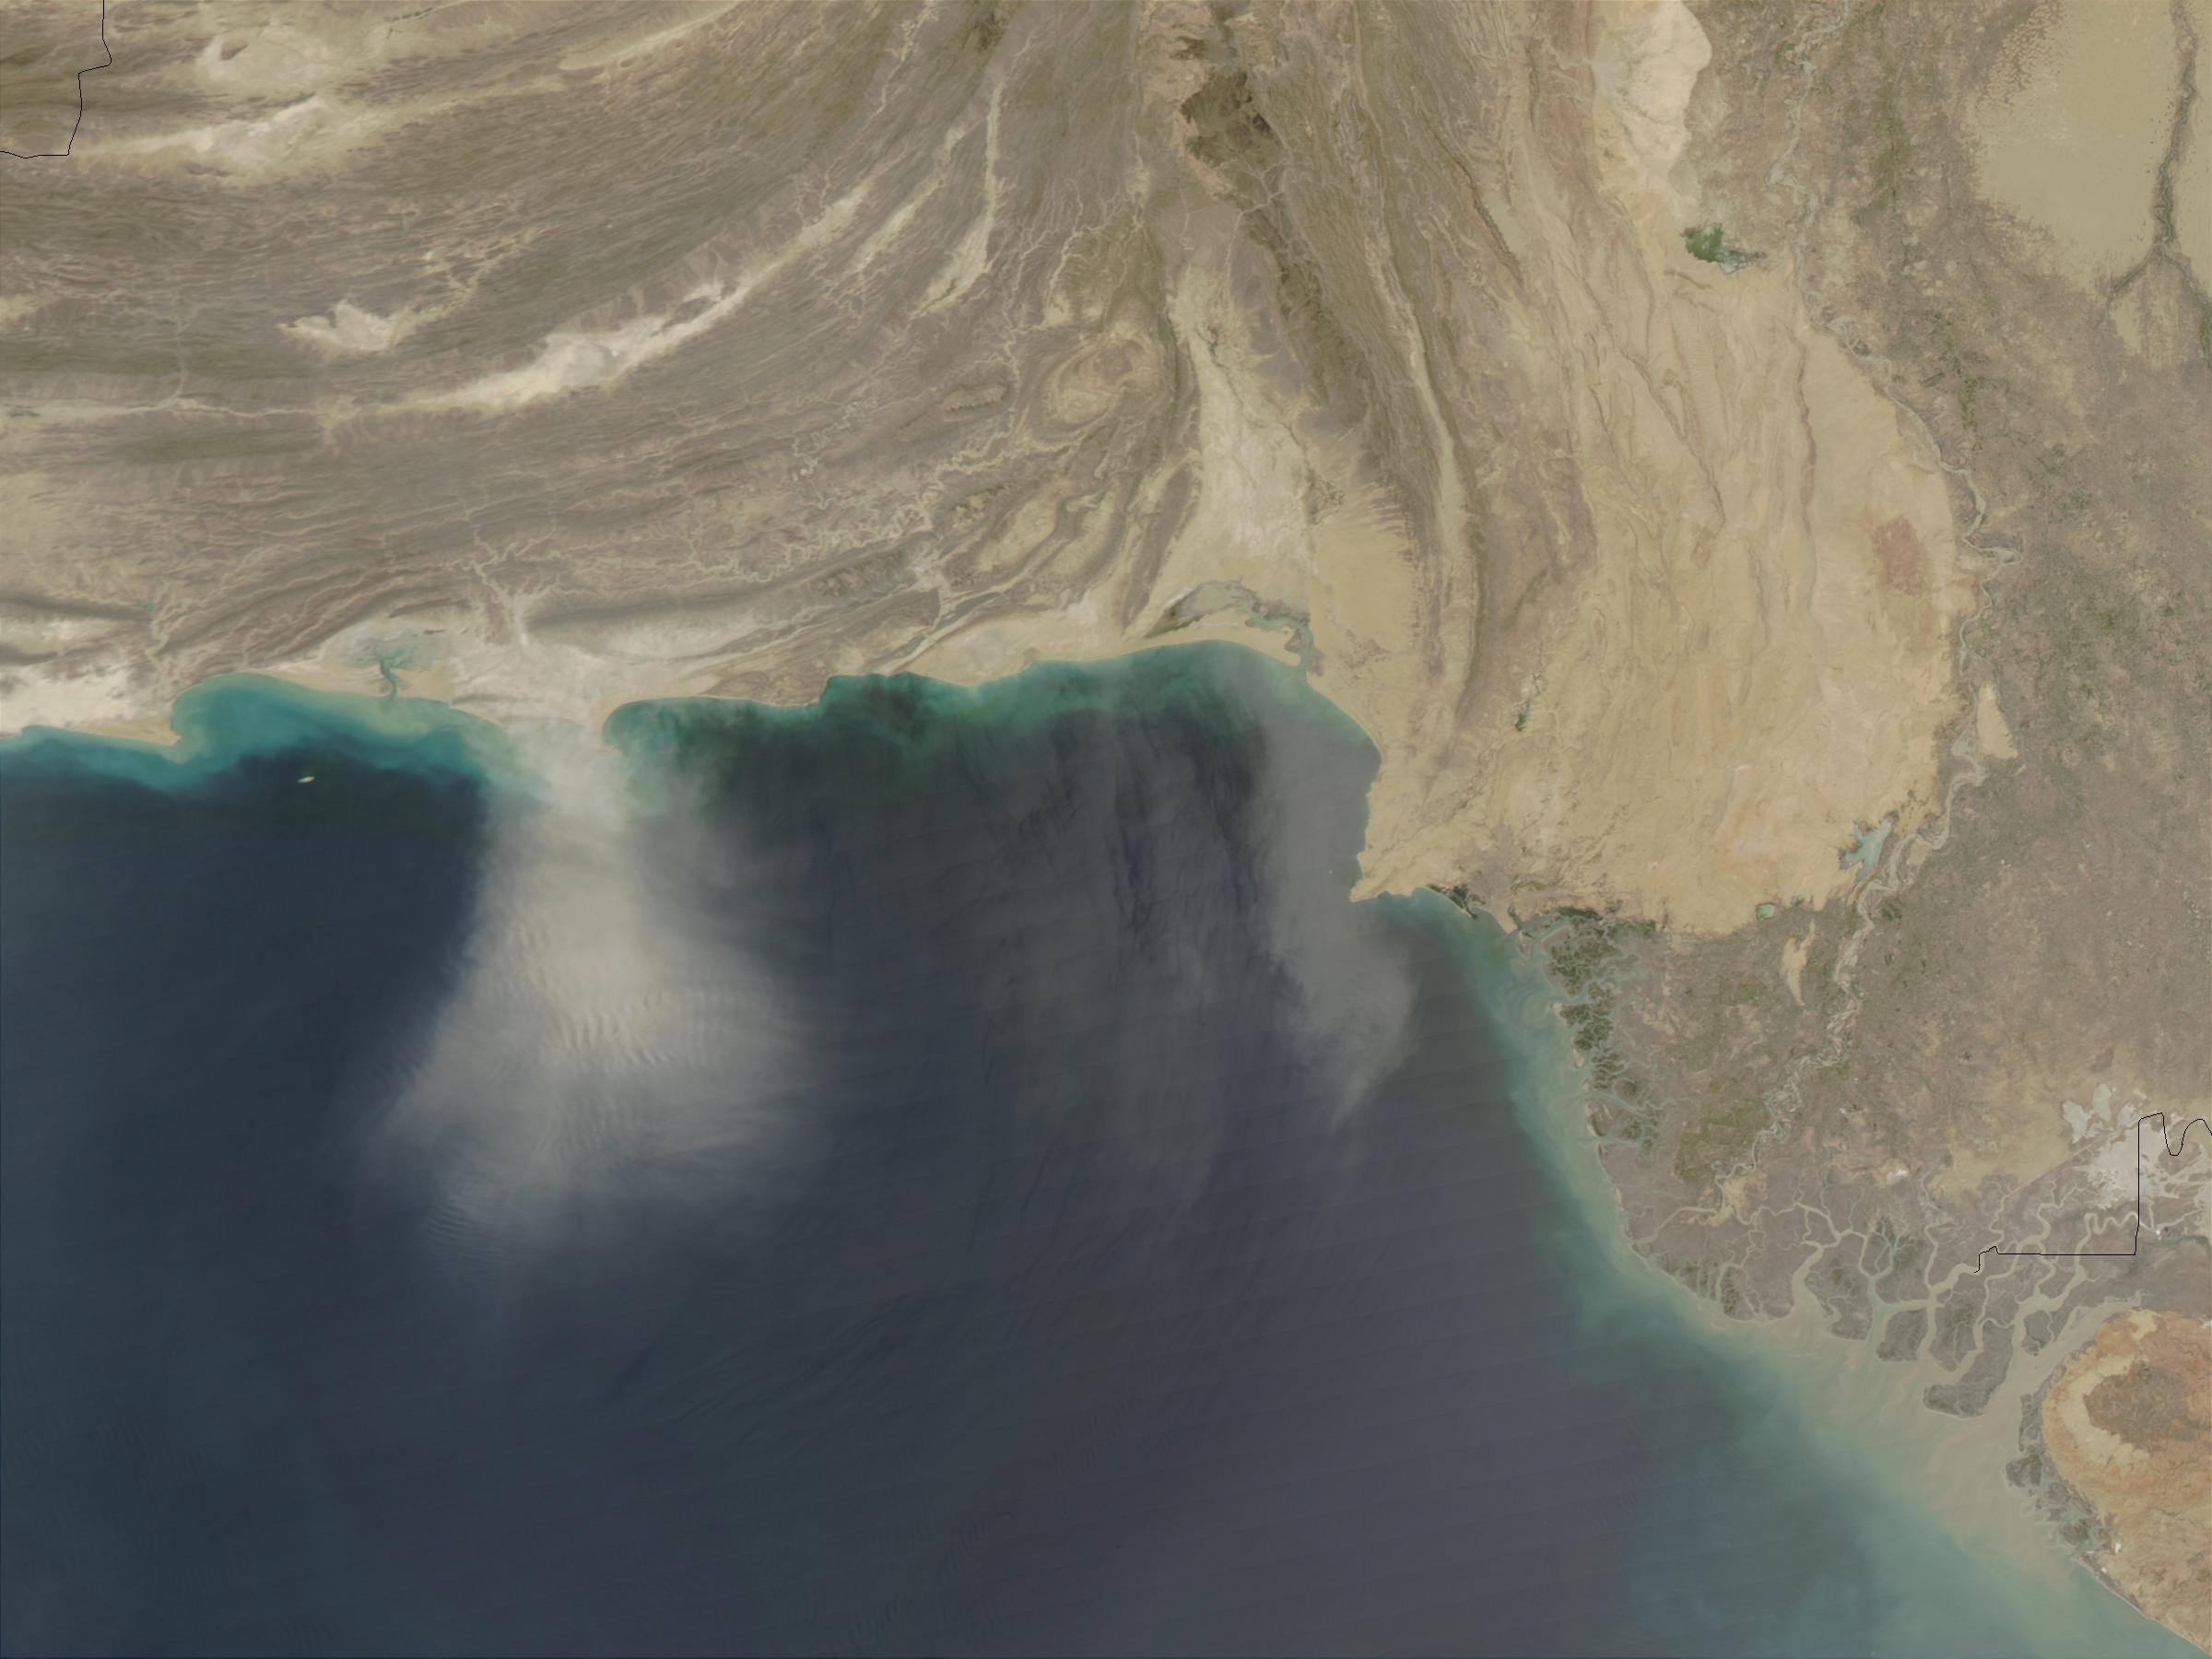 Tormenta de polvareda cerca de Pakistán